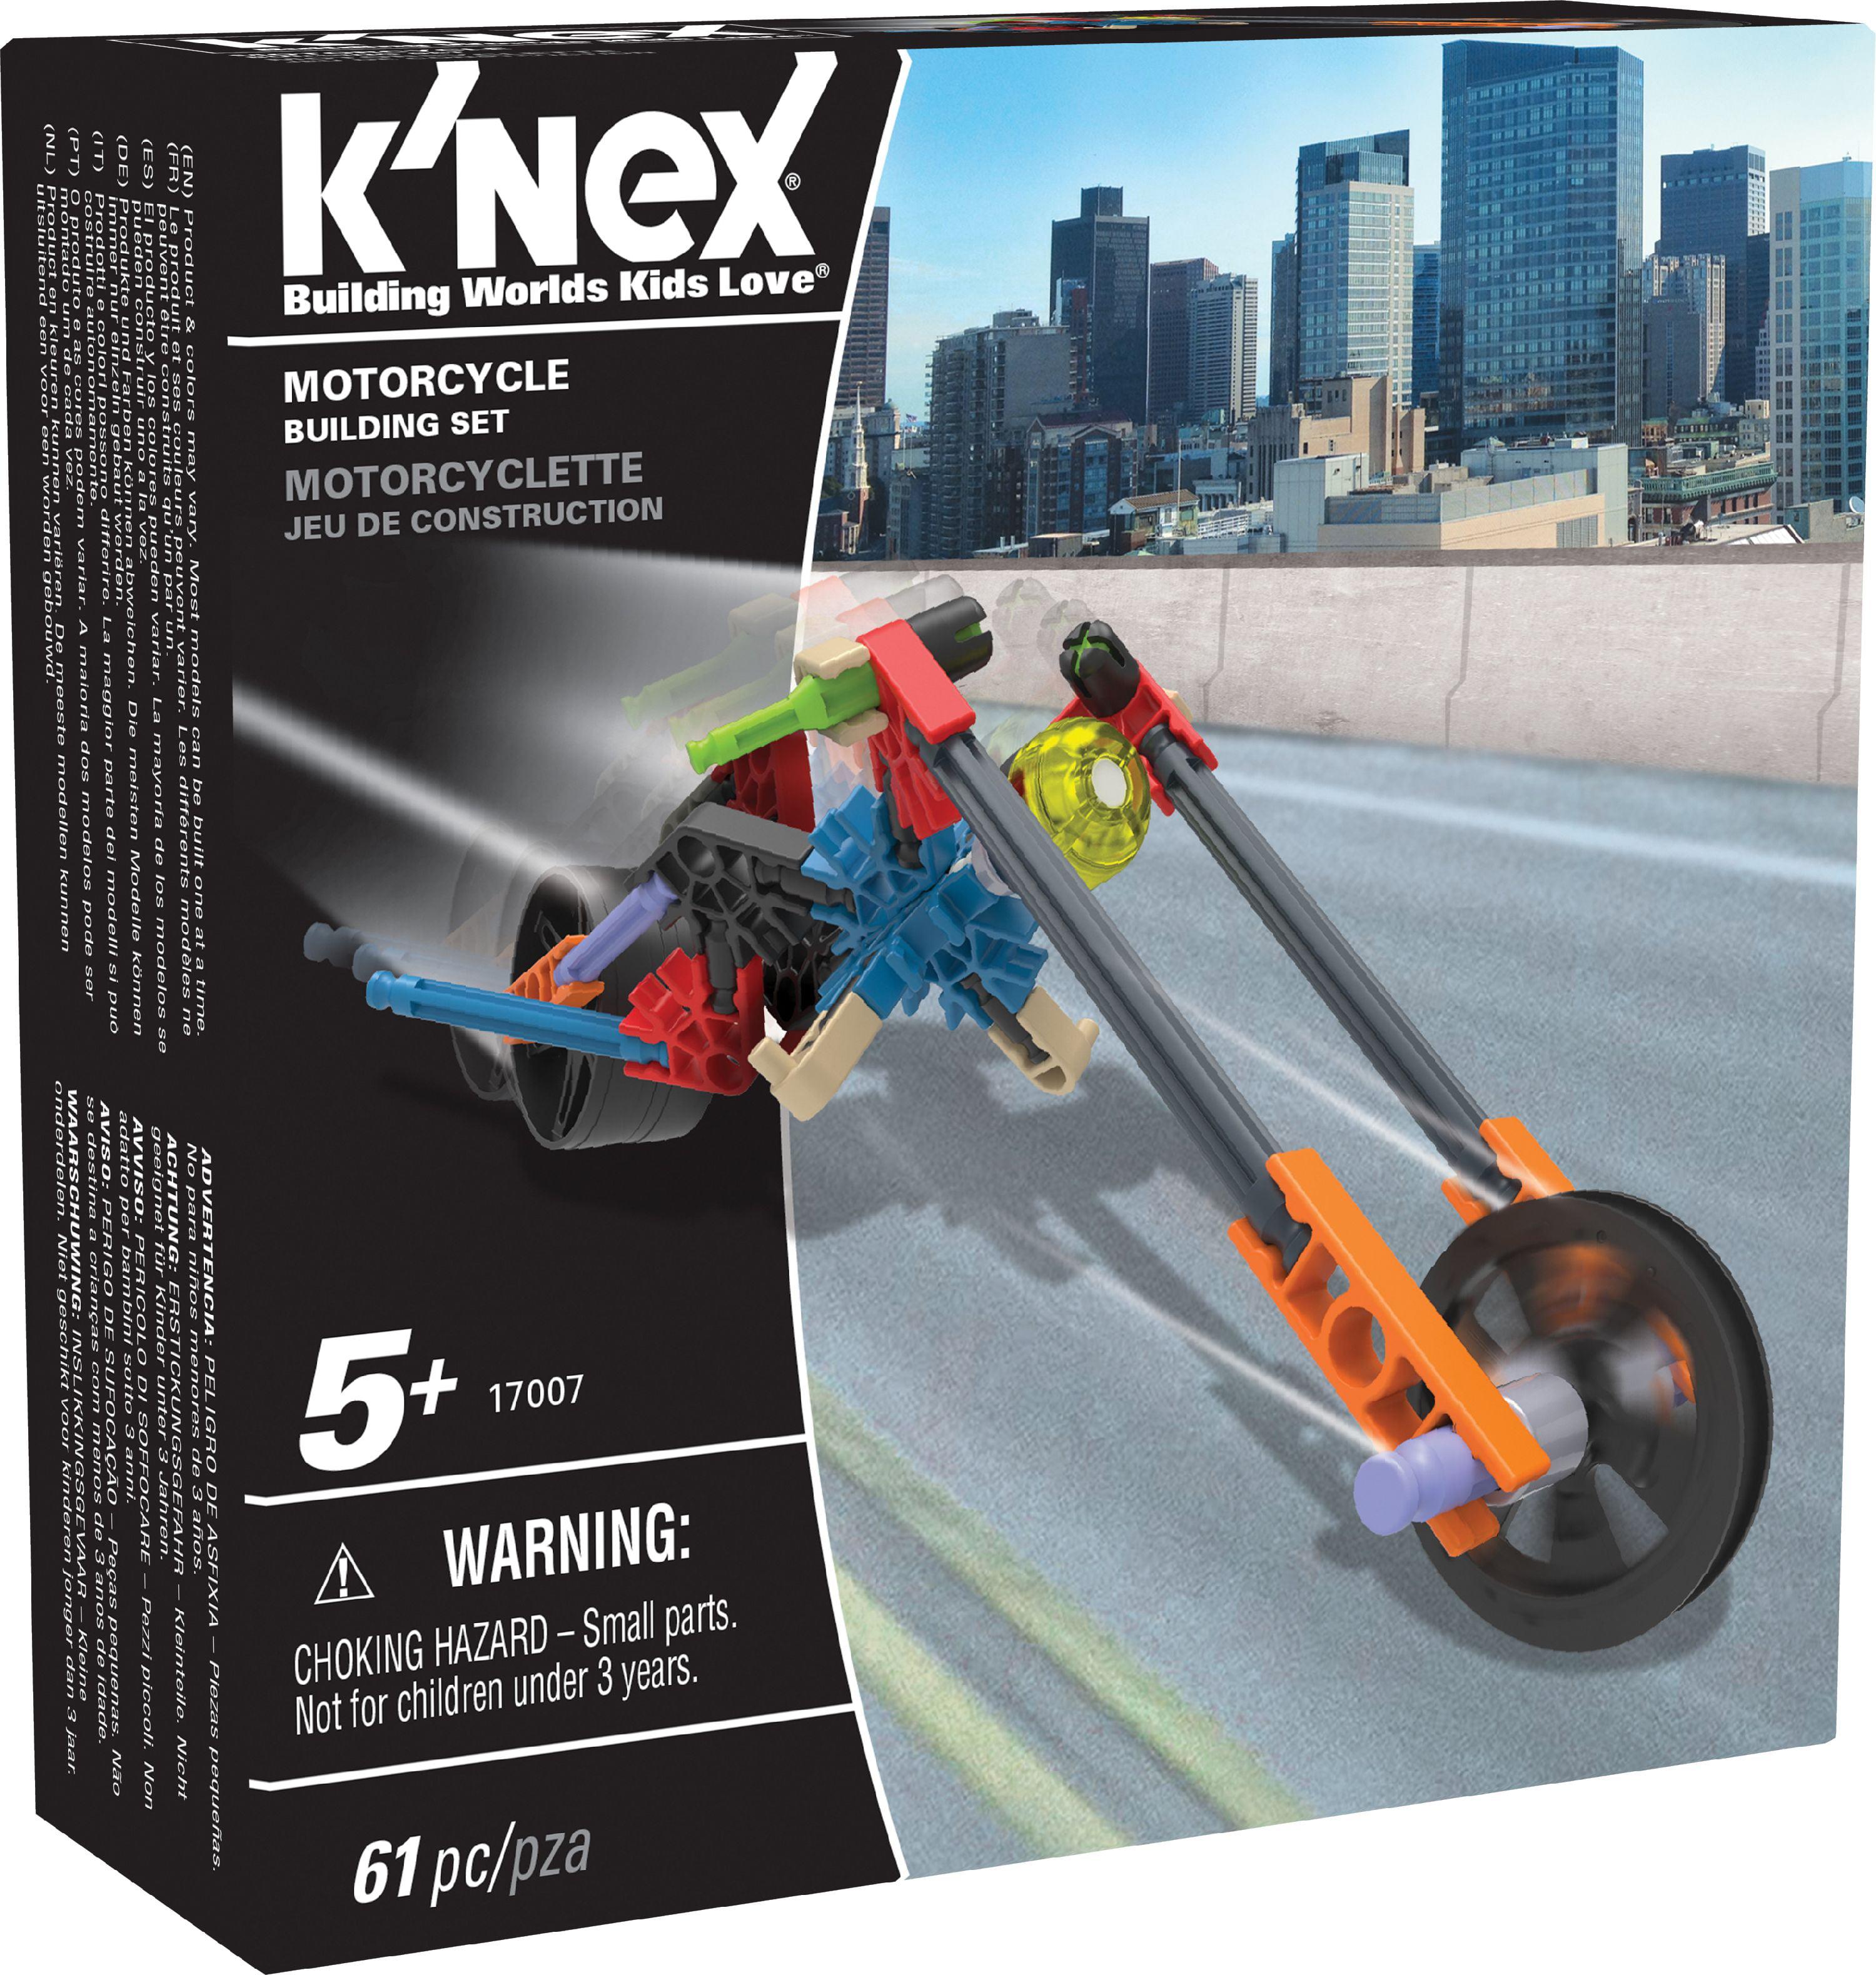 K'NEX Imagine - Motorcycle Building Set 61 Pieces For Ages 5+ Construction Education Toy